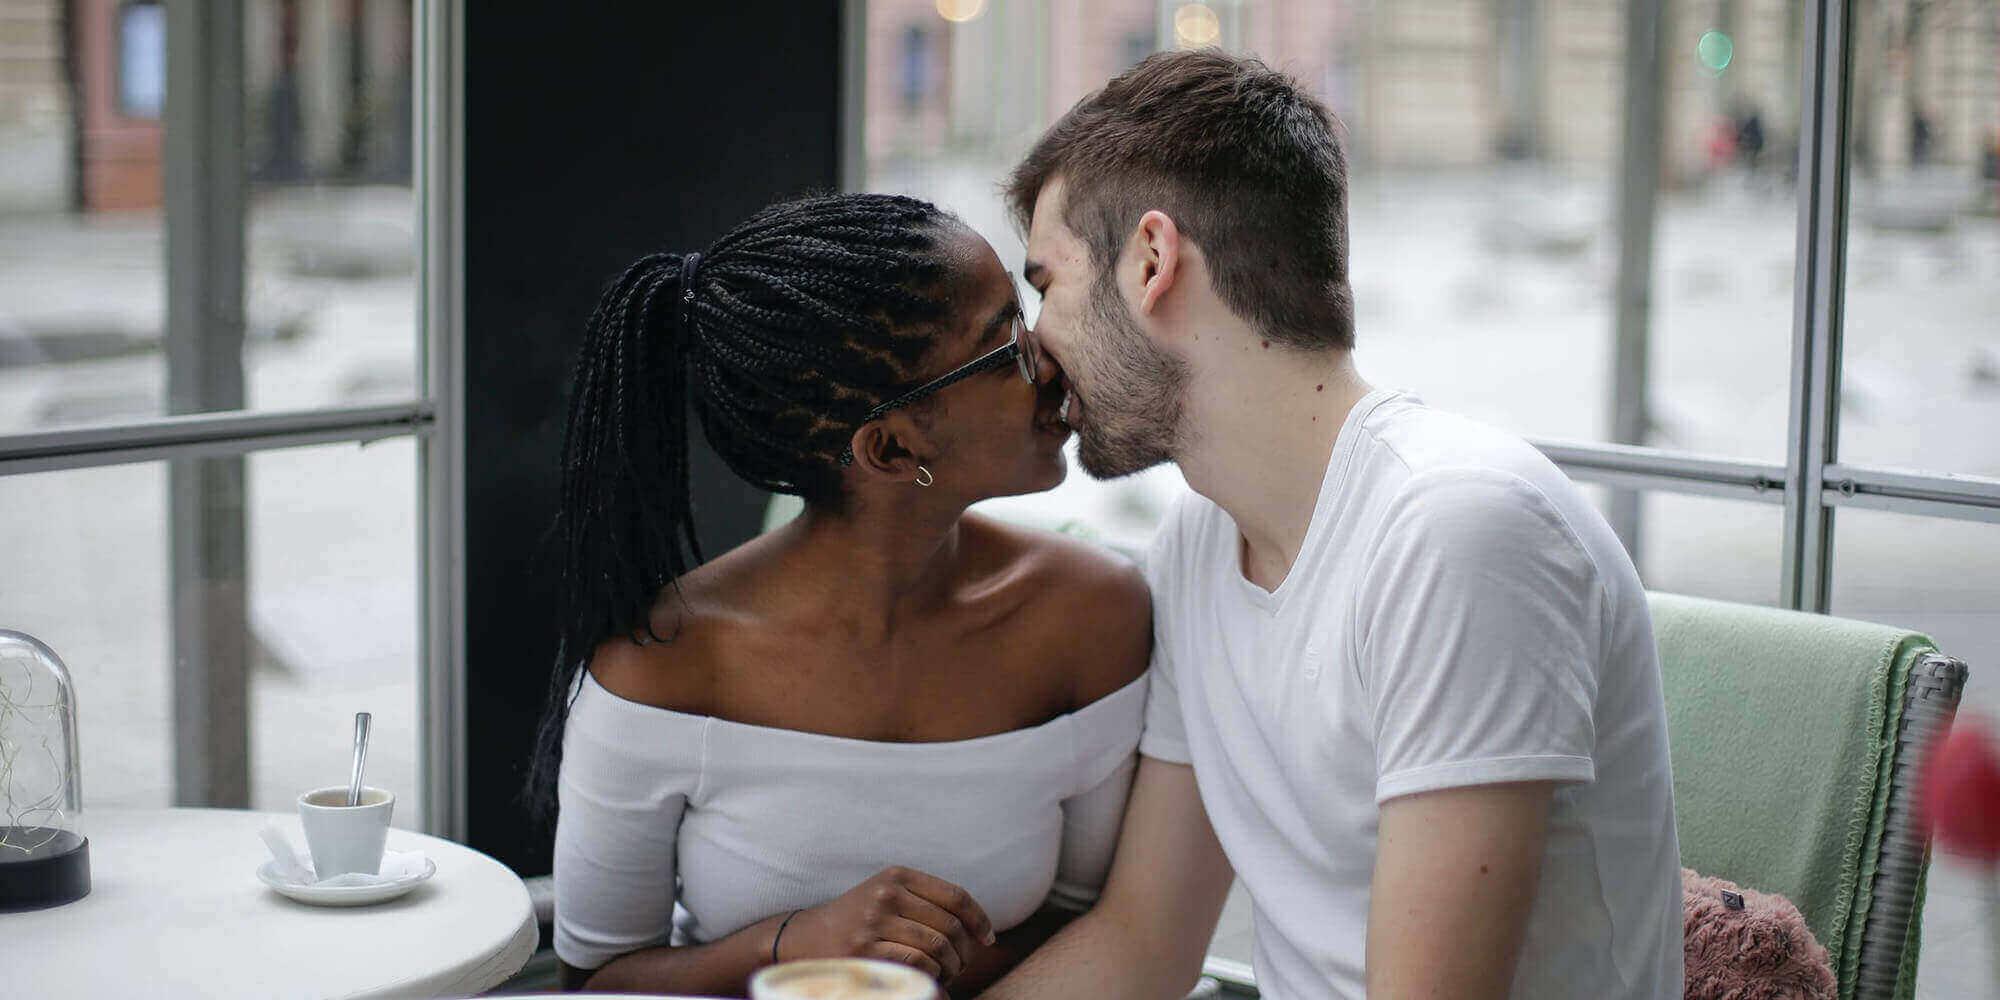 A Black woman and white man kissing